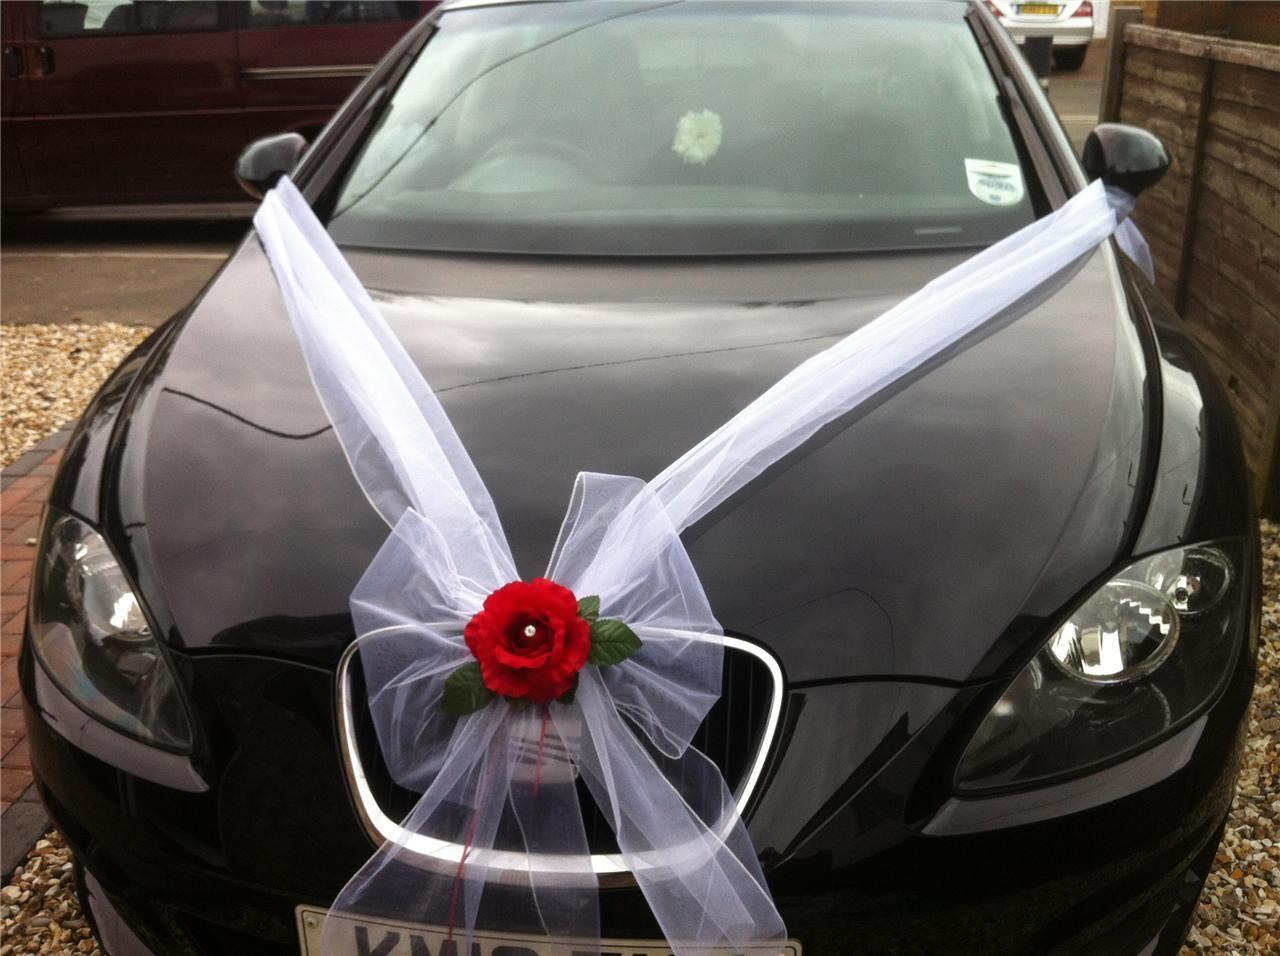 Wedding car flower decoration images  Wedding Car Flower Decoration White Organza Rose Detail Ribbon